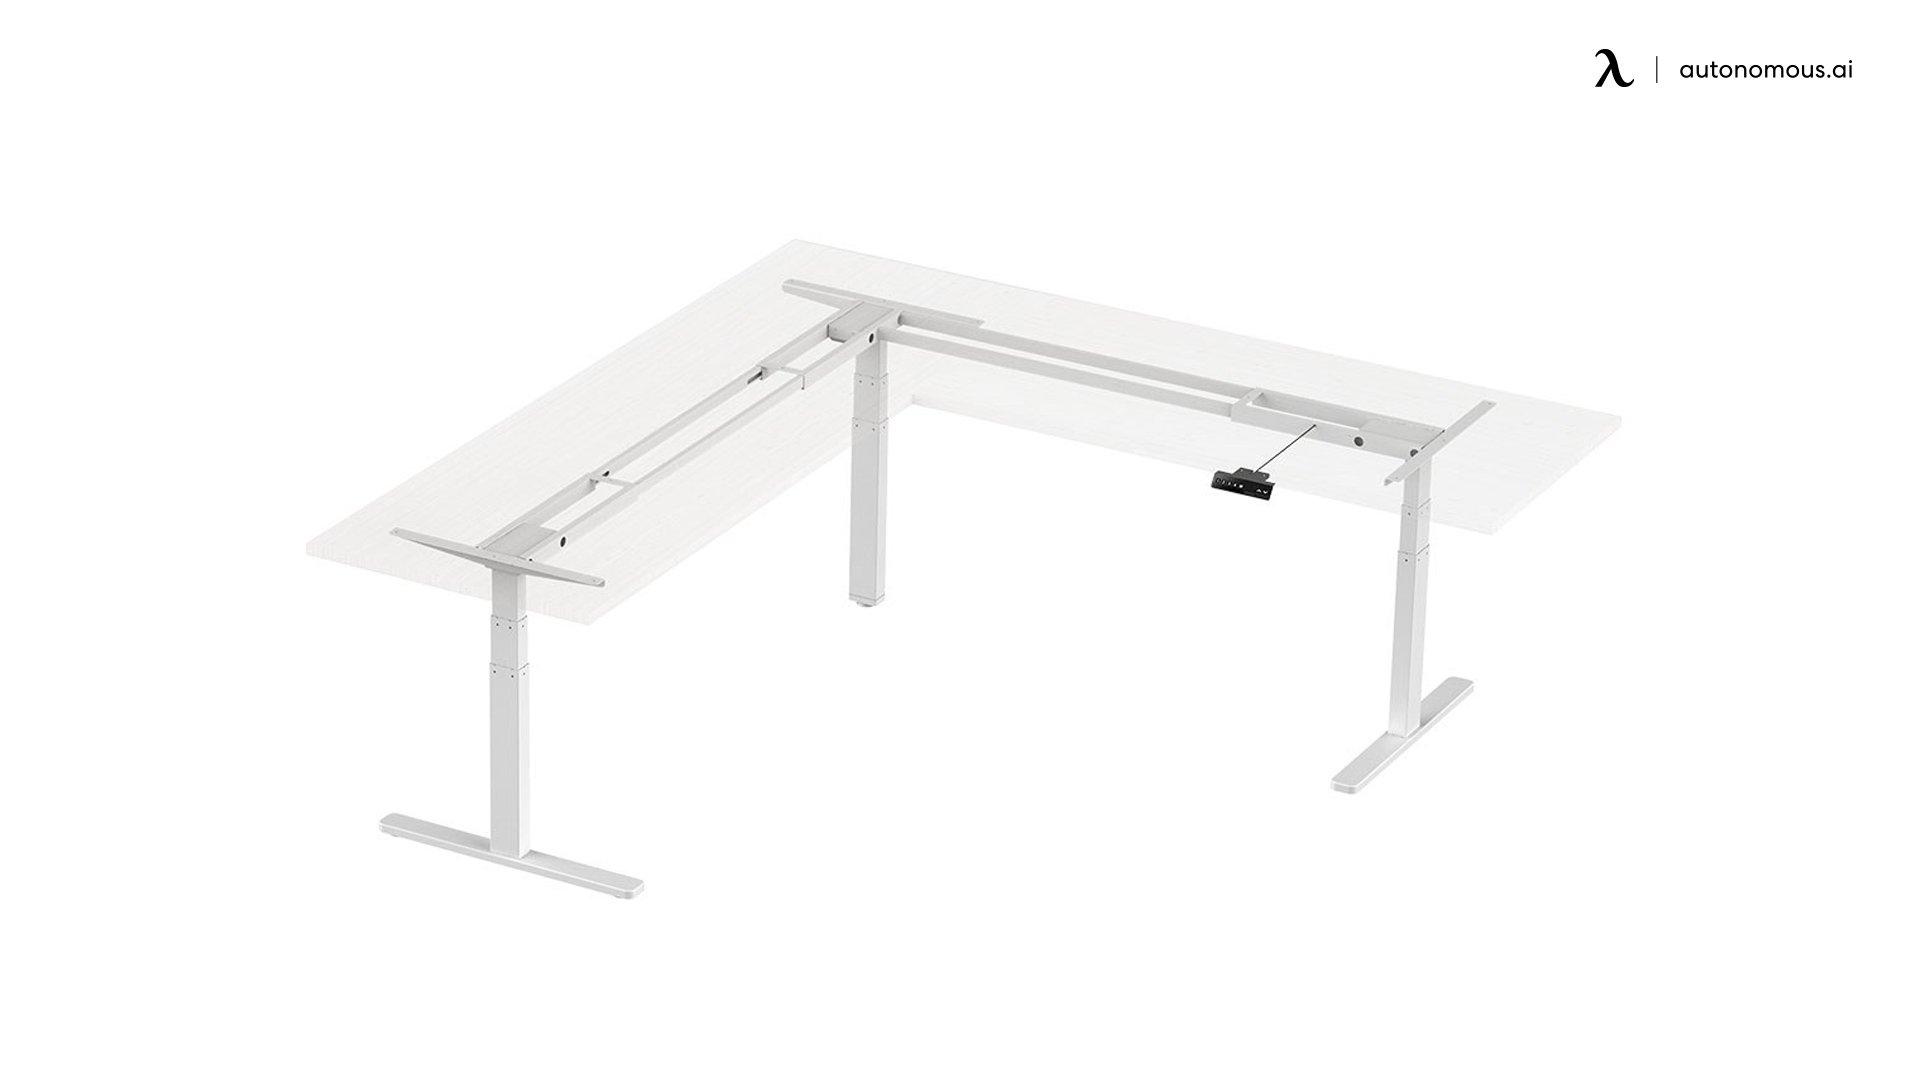 Monoprice Sit-Stand Corner Desk Frame